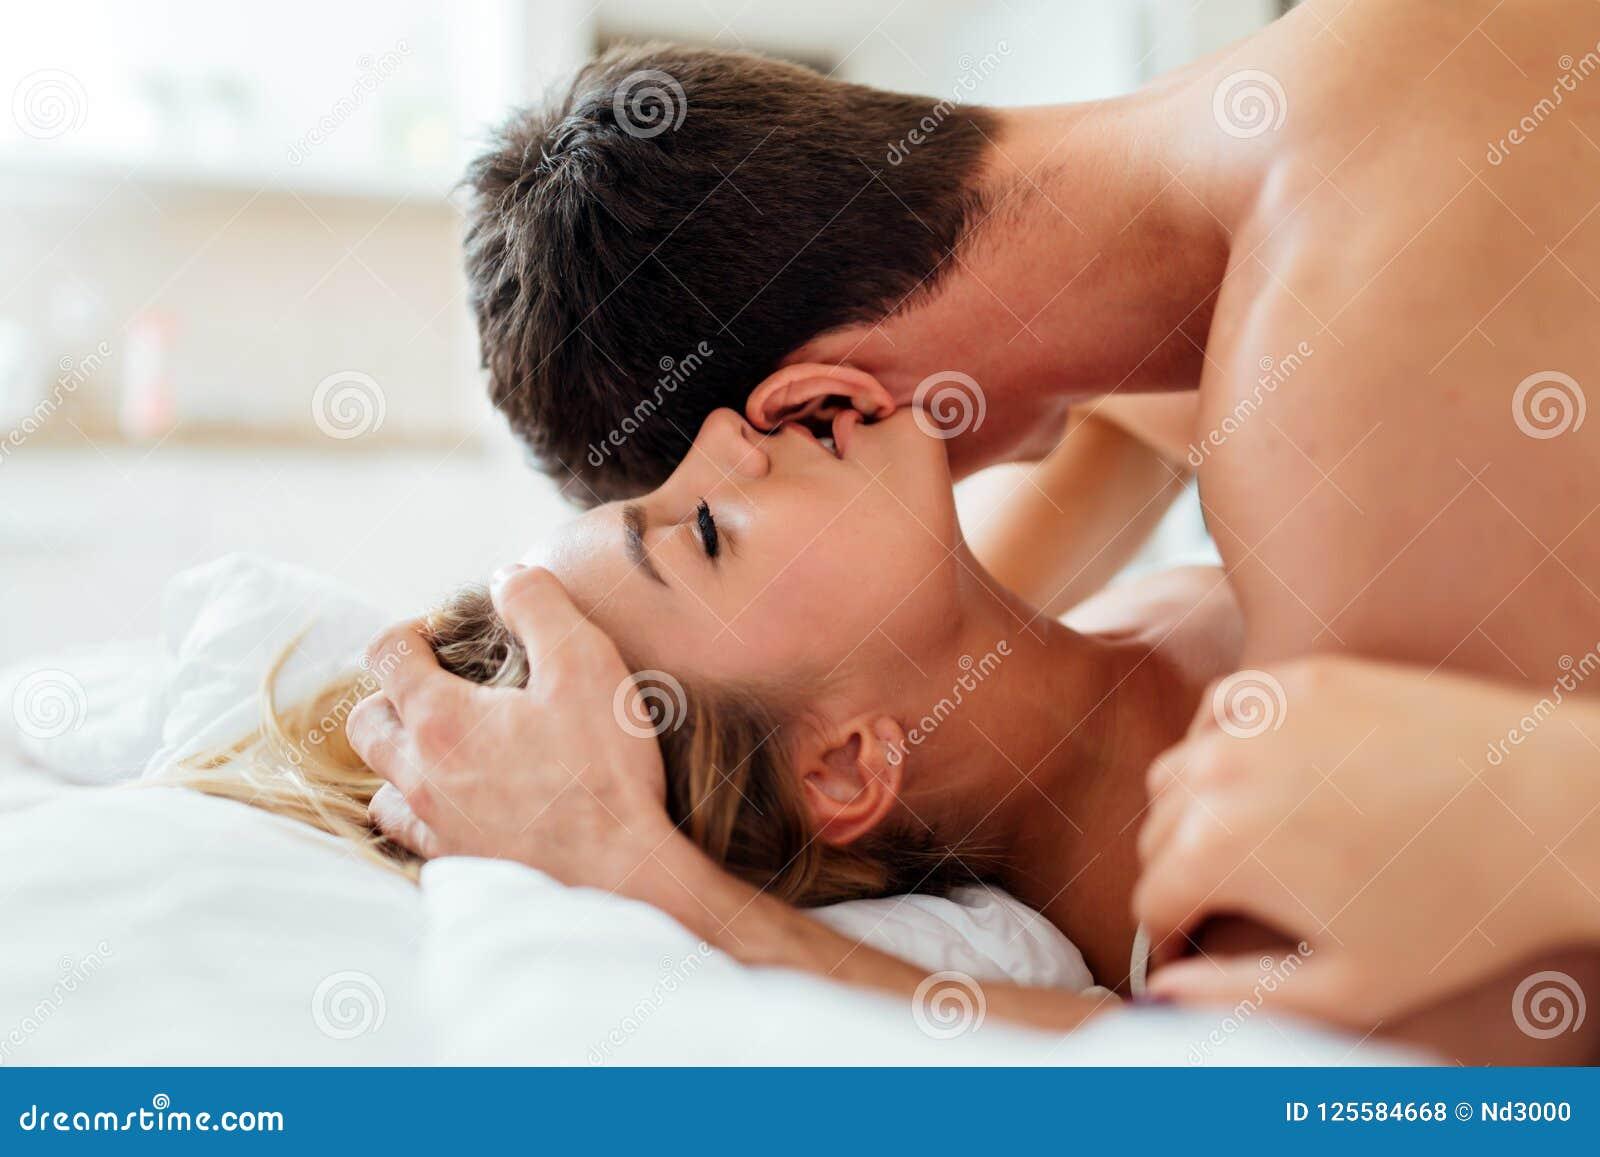 Lovemaking photos